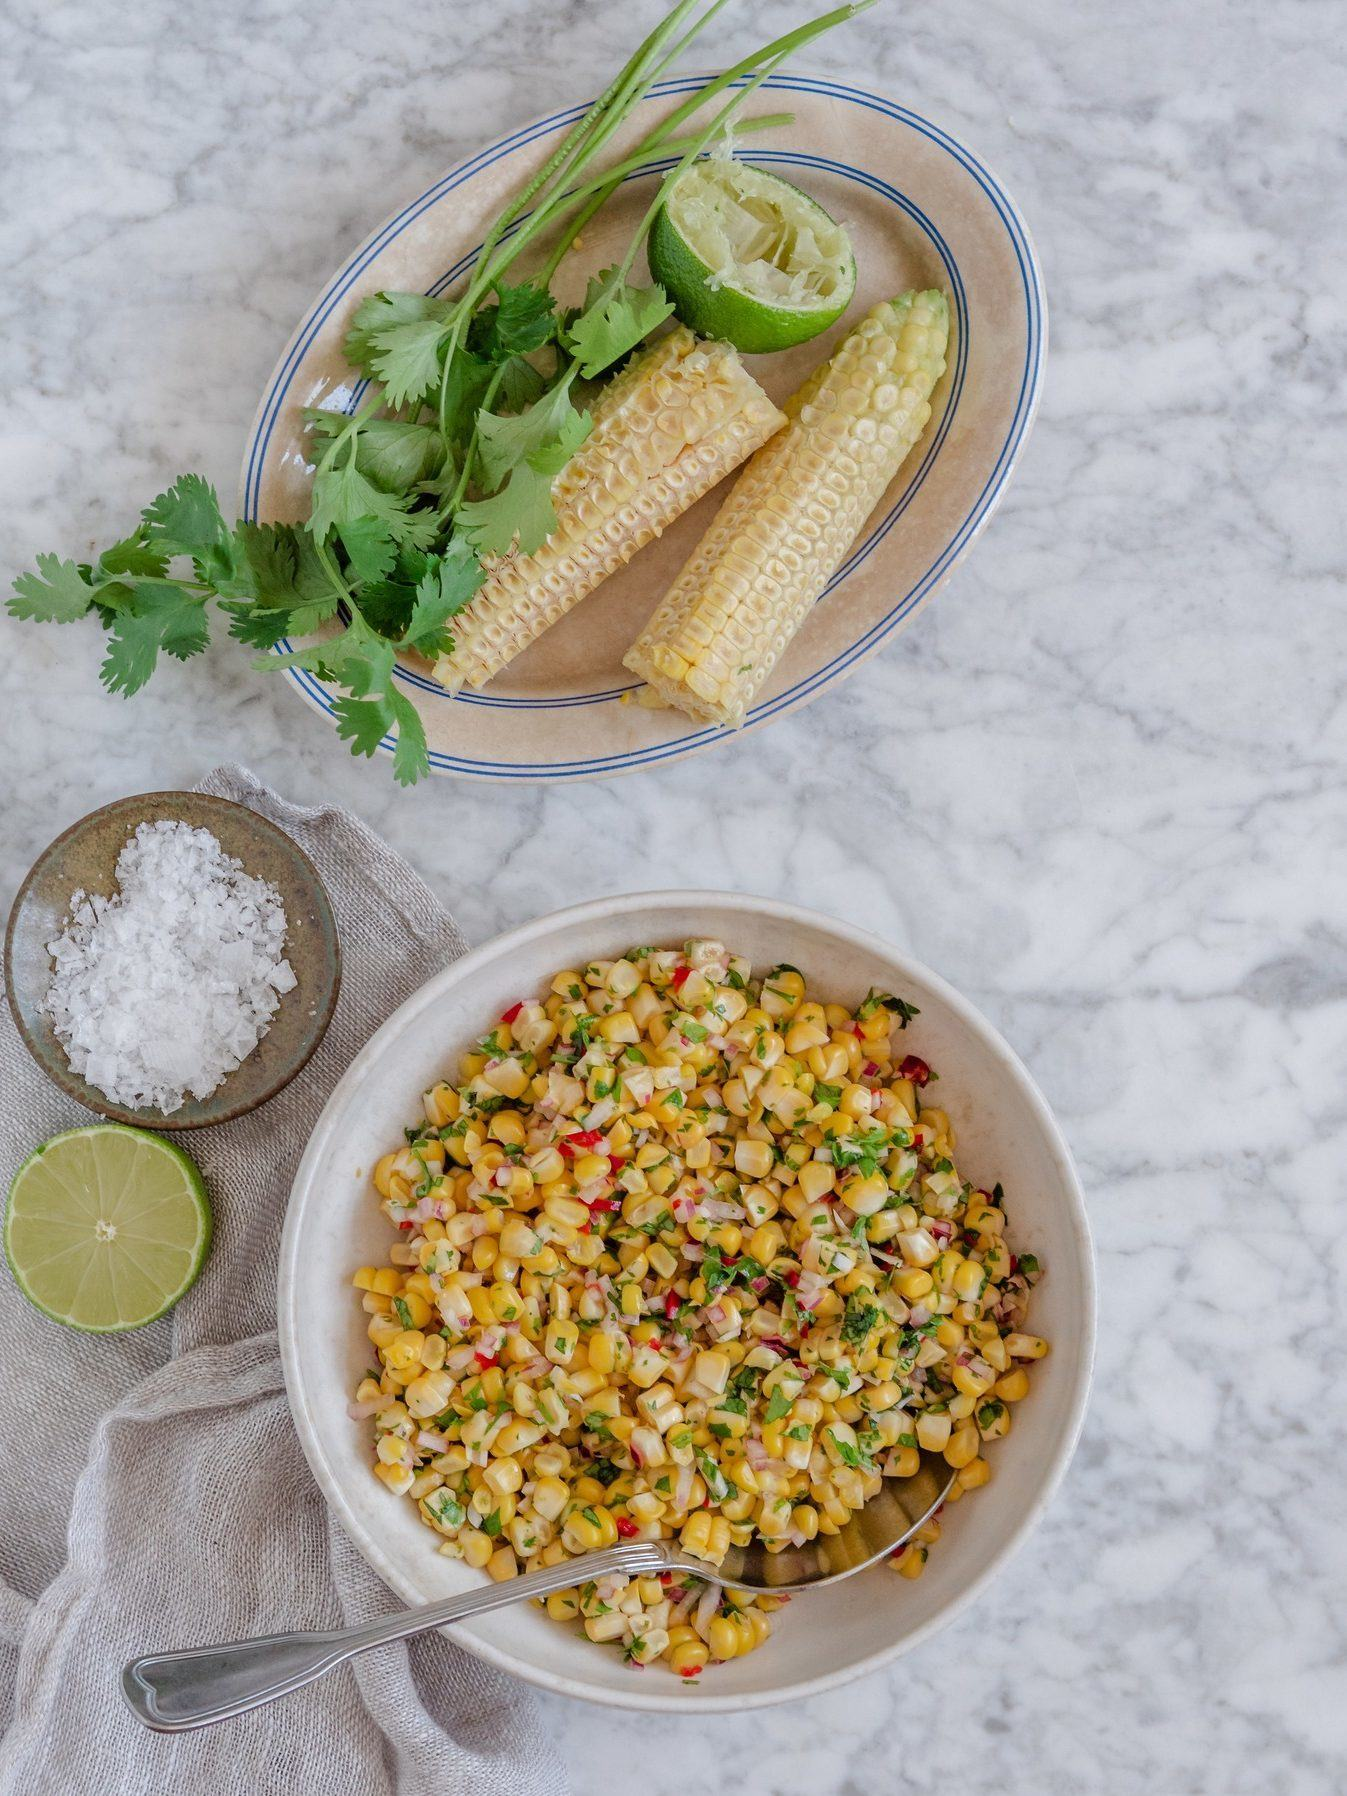 majssalsa med koriander og lime